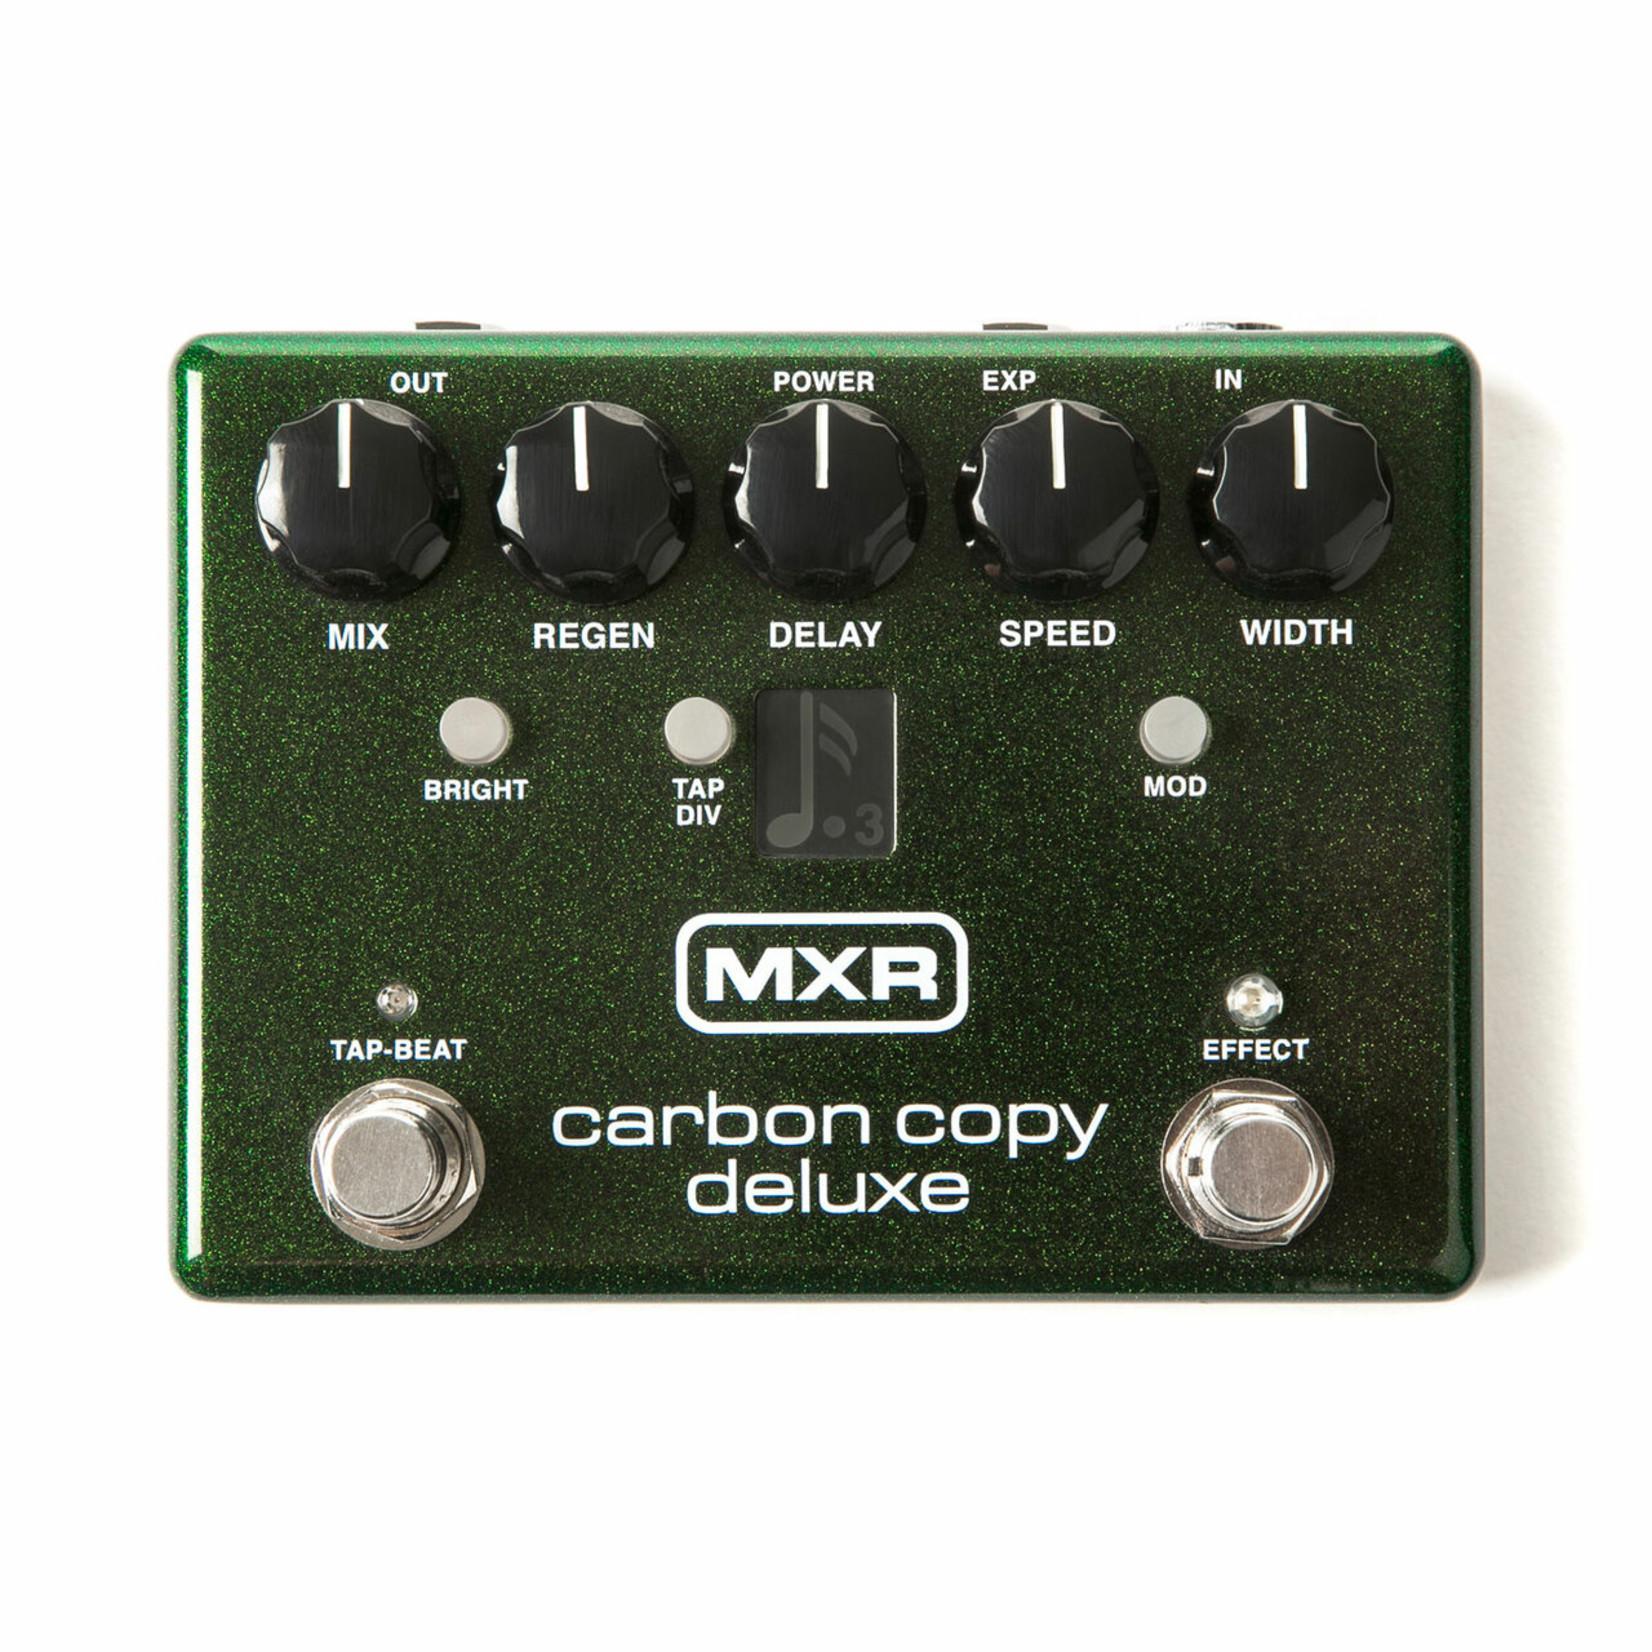 MXR MXR M292 Carbon Copy Deluxe Delay